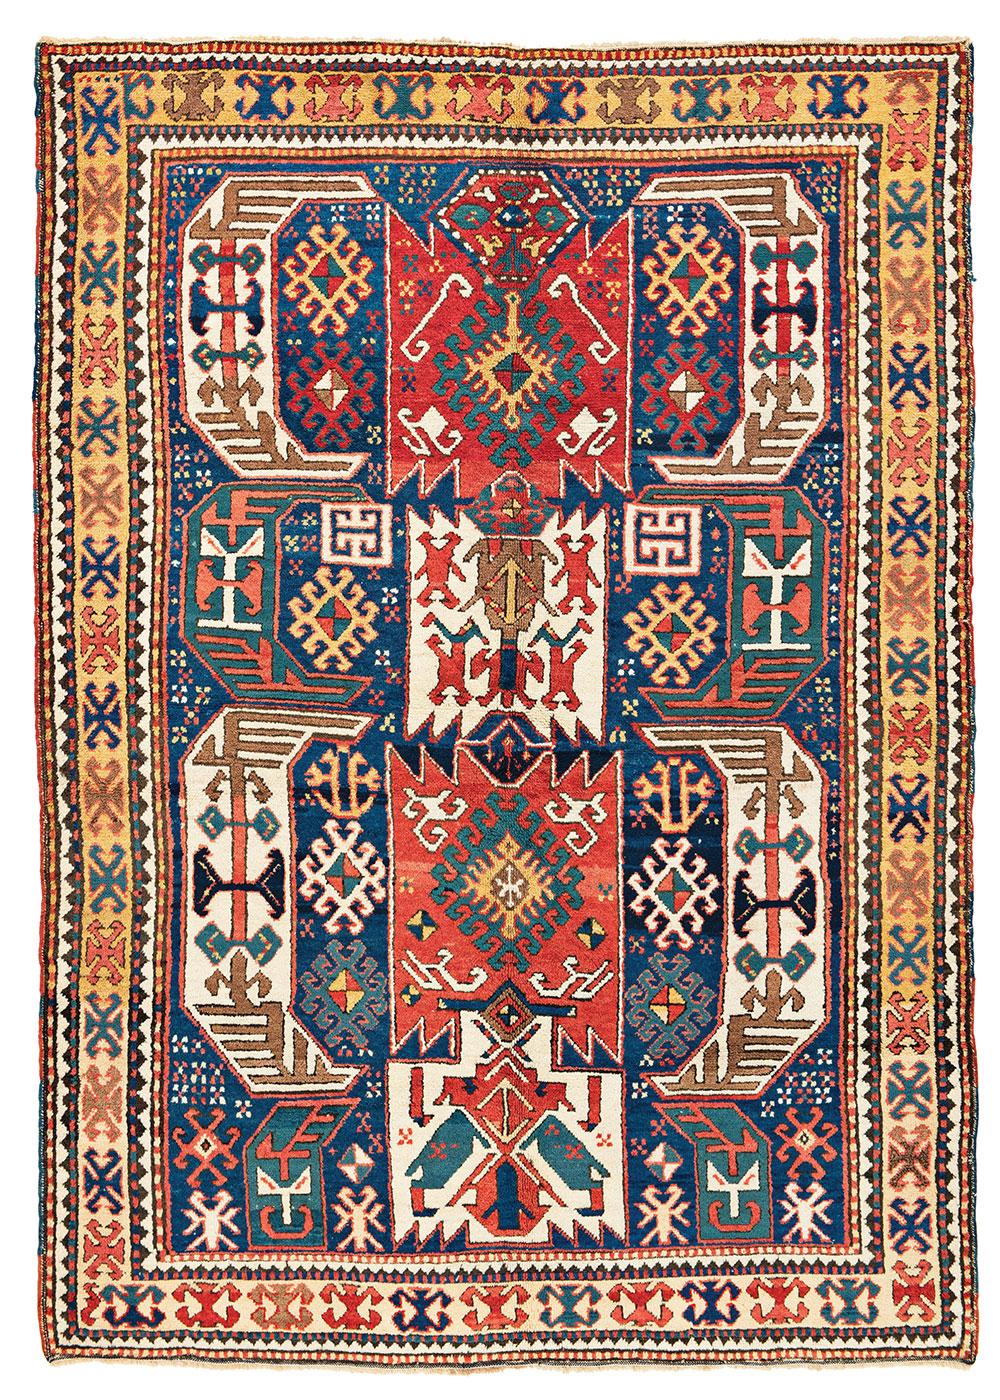 Bahmanli rug Third quarter 19th century 1.50 x 2.10 m (4' 11'' x 6' 11'') Austria Auction Company Vienna 1 August 2020, Lot 24 Est: €5,000-7,000 Sold: €20,000 ($23,550)